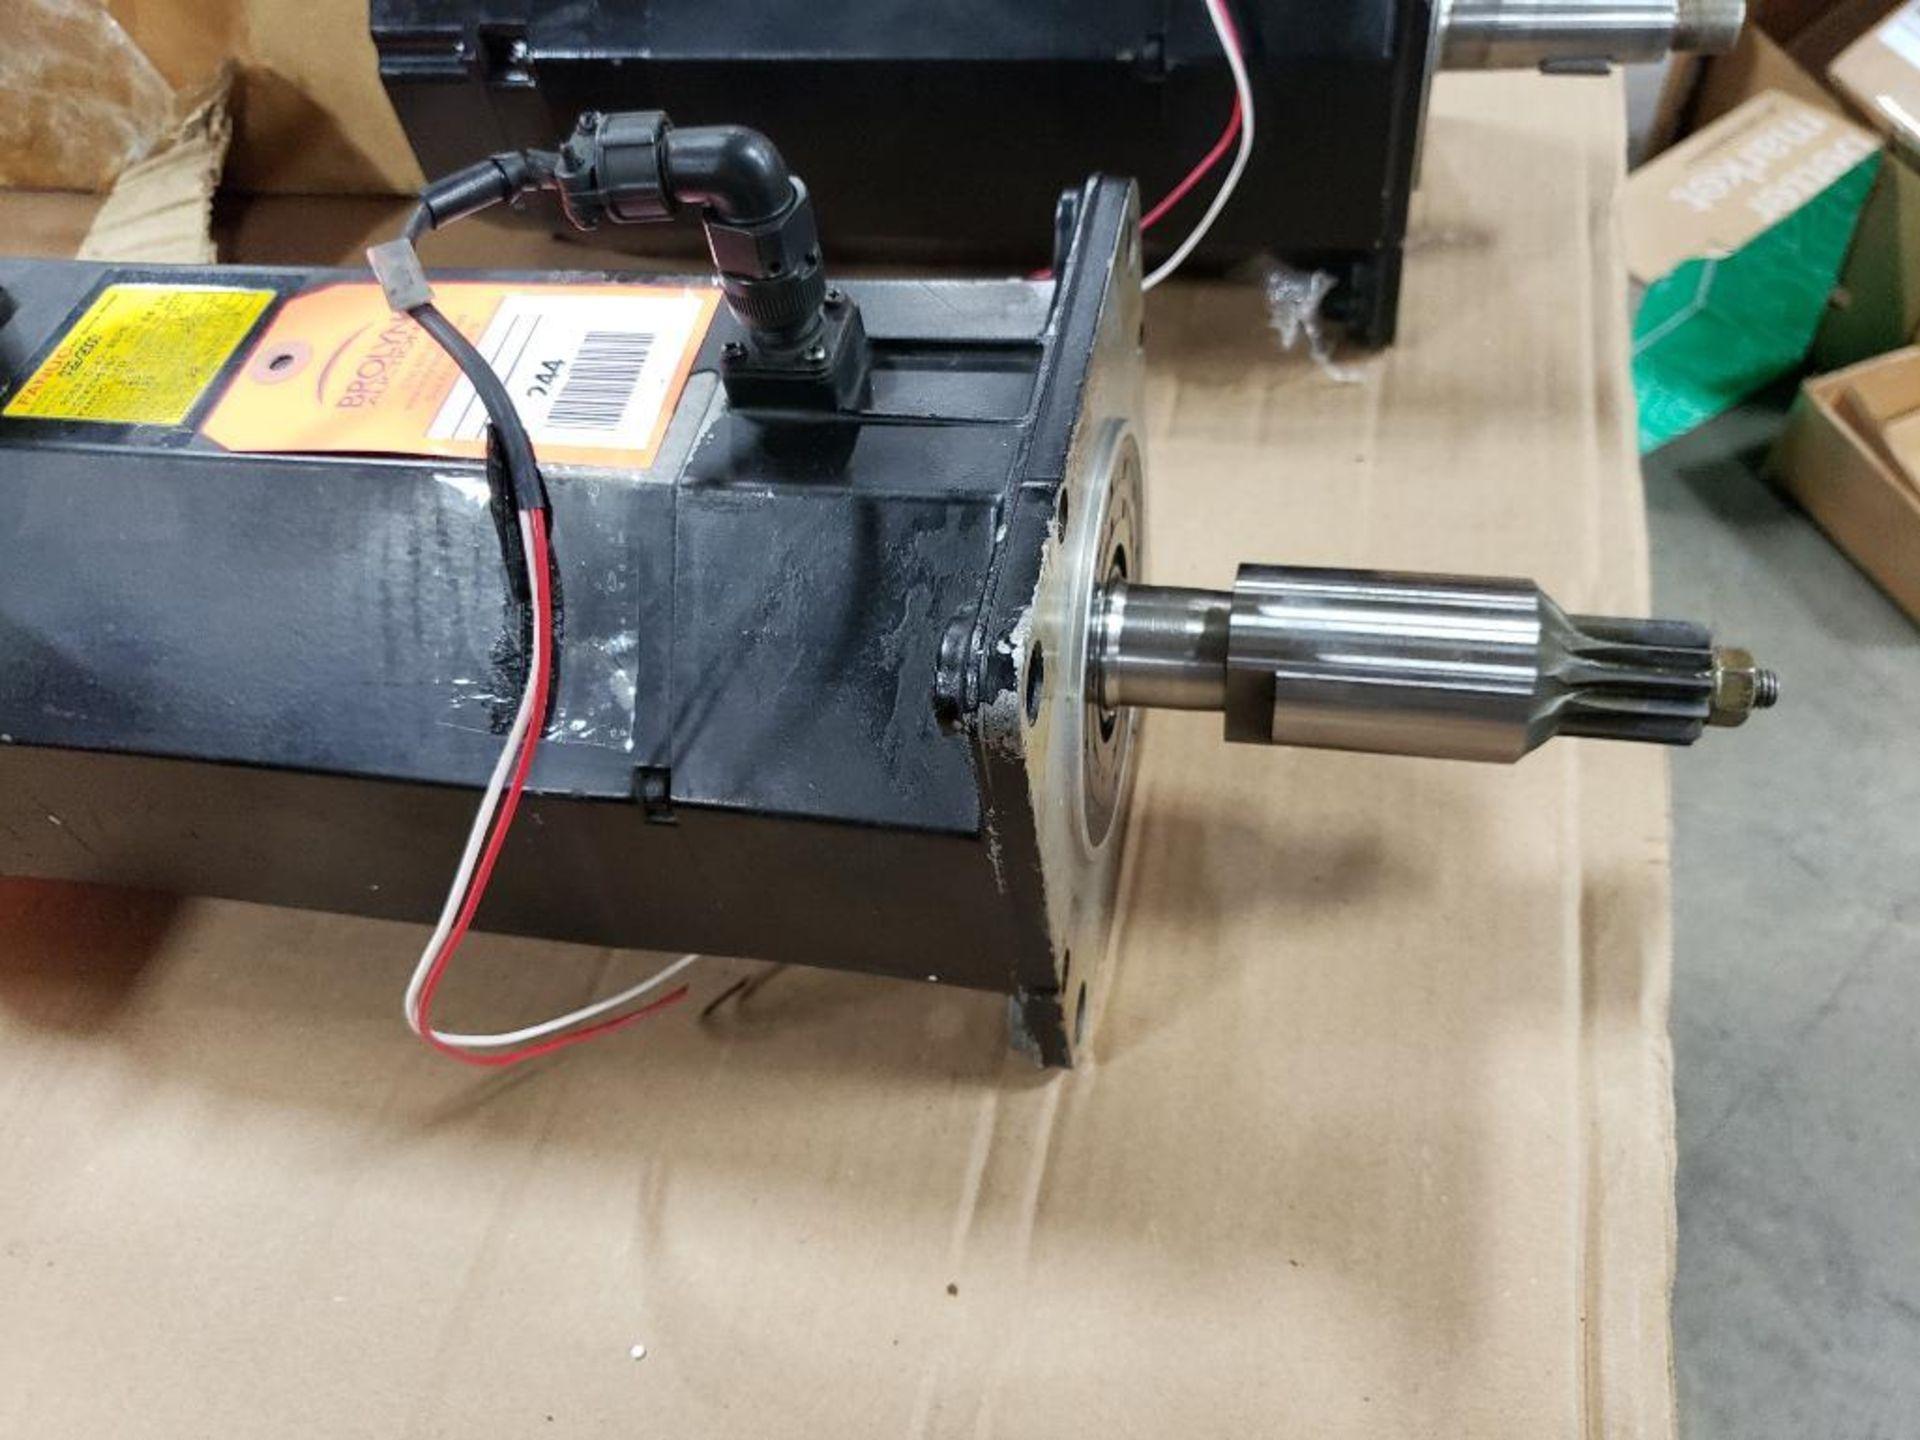 3.8kW GE Fanuc AC Servo Motor A06B-0147-B675. 157V, 2000RPM, 3PH. - Image 4 of 5